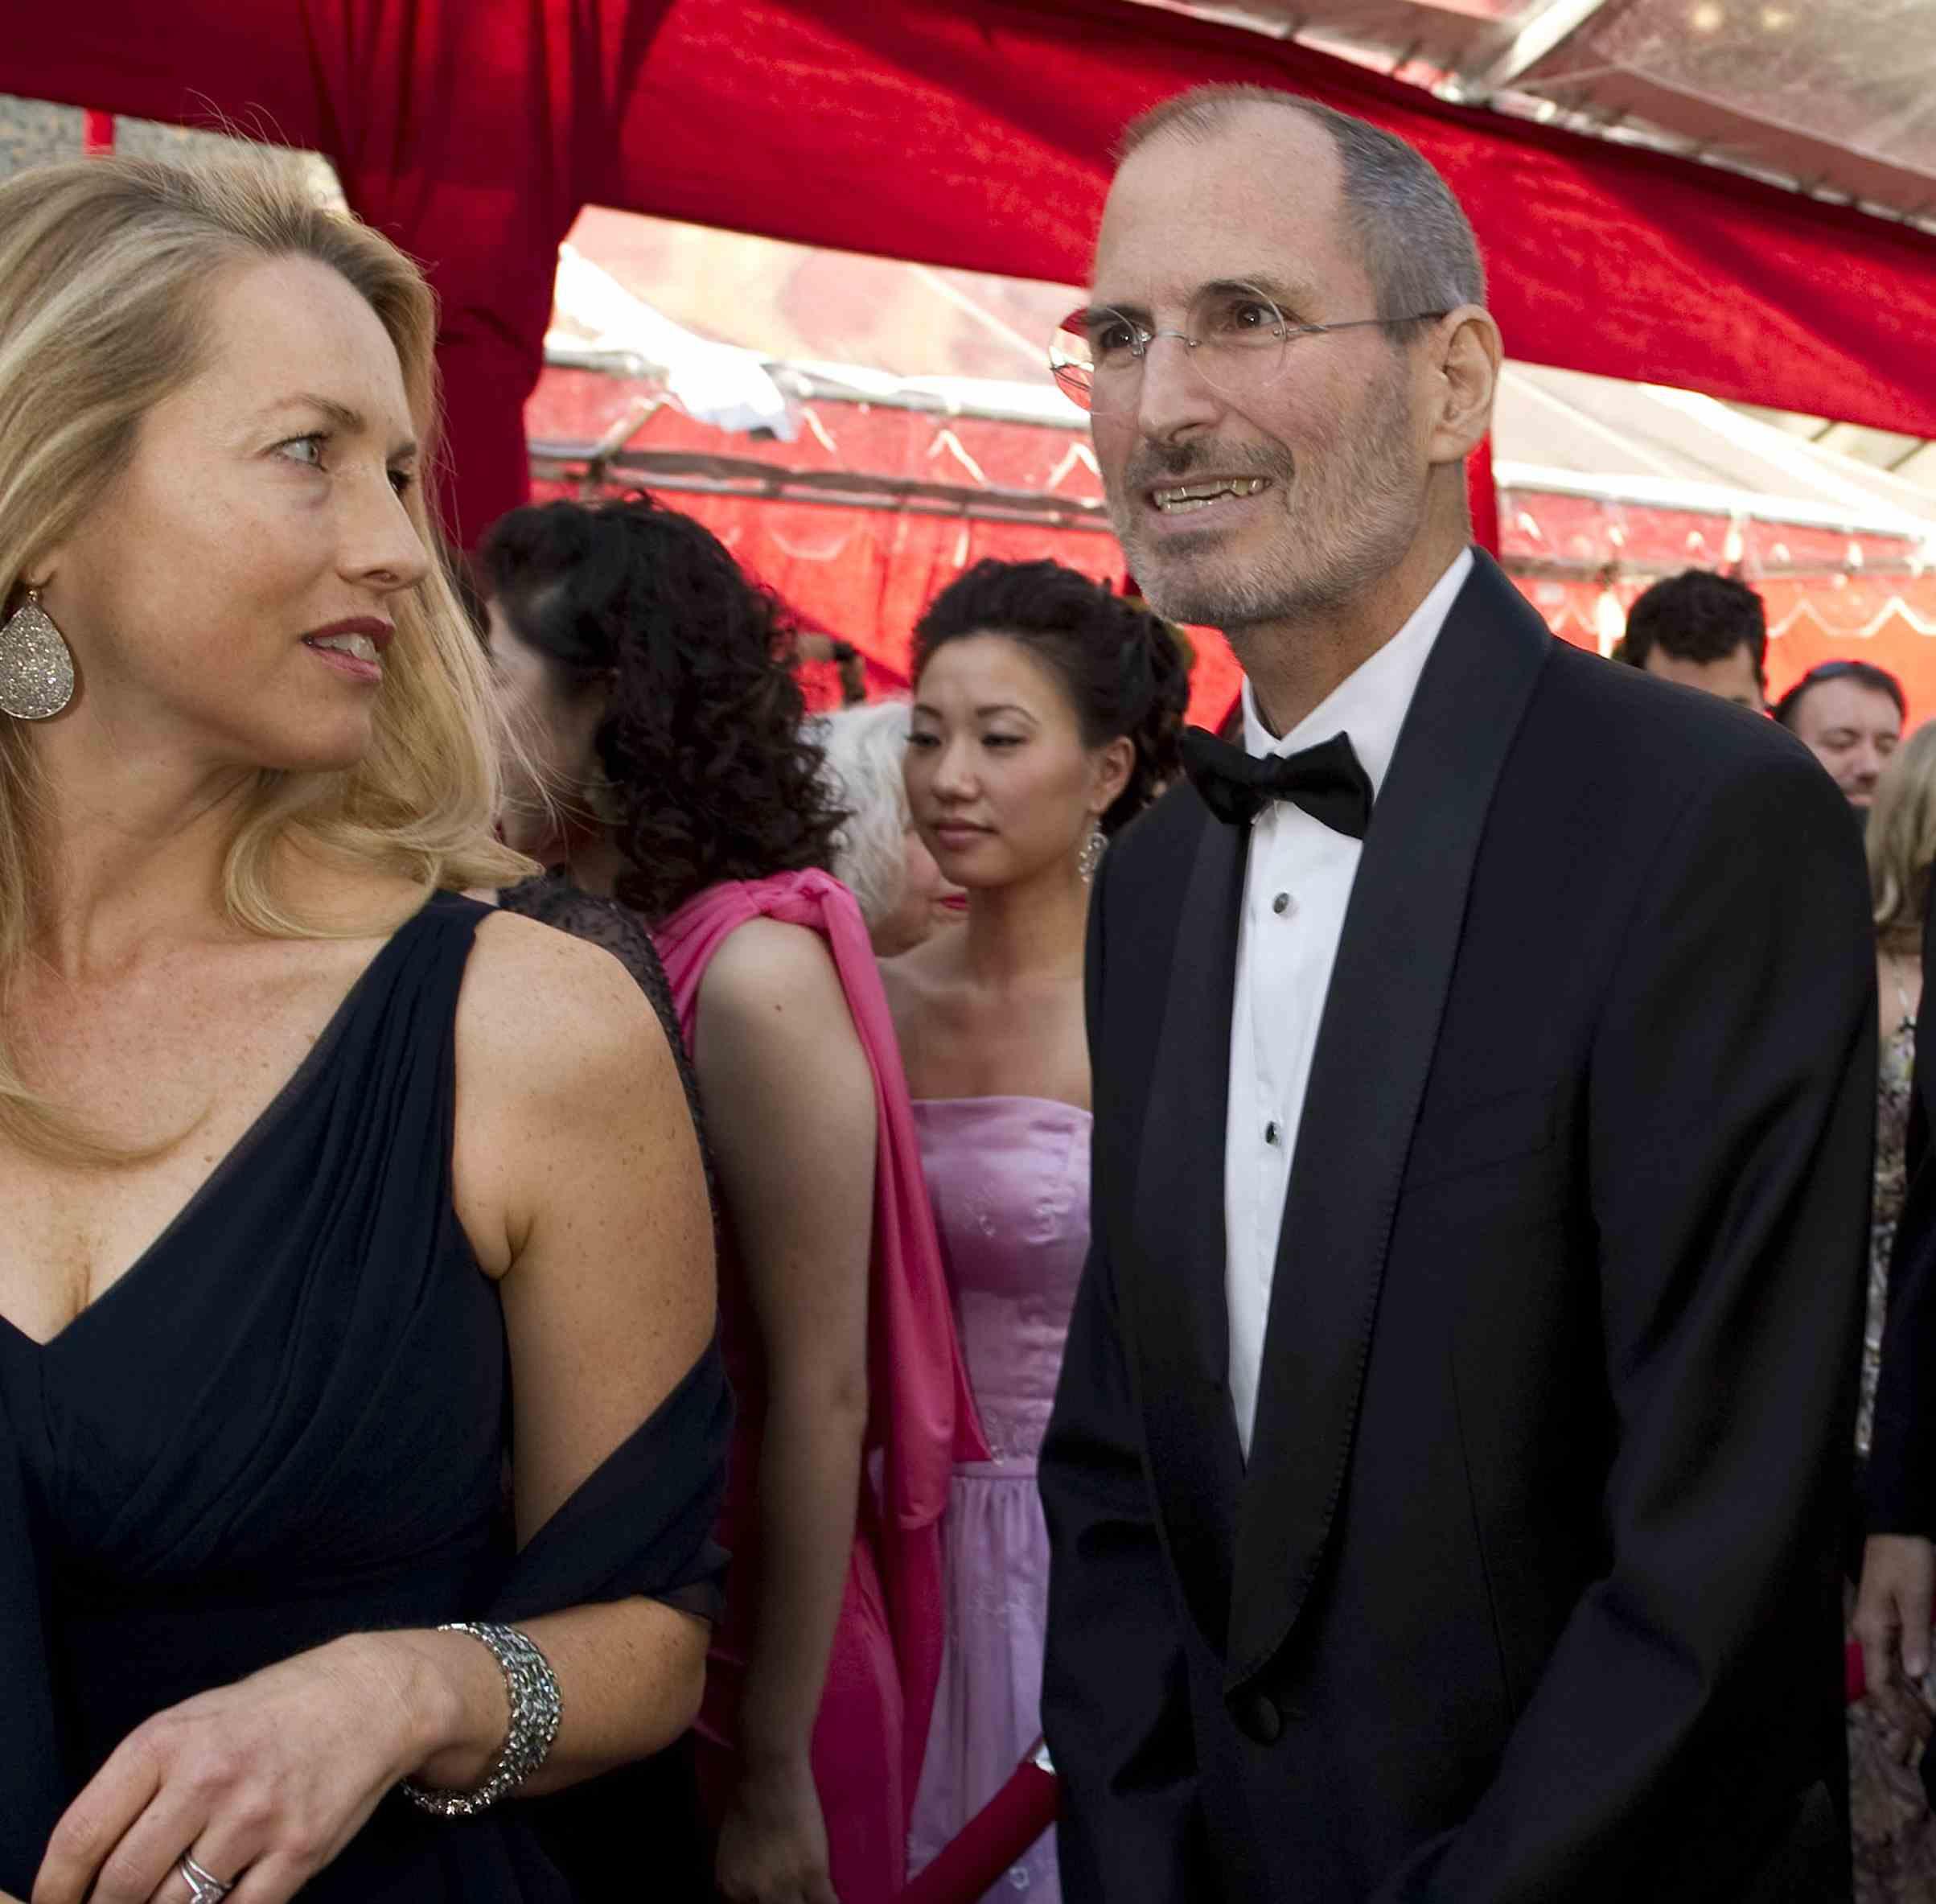 Steve Jobs Biography For Earlier Release